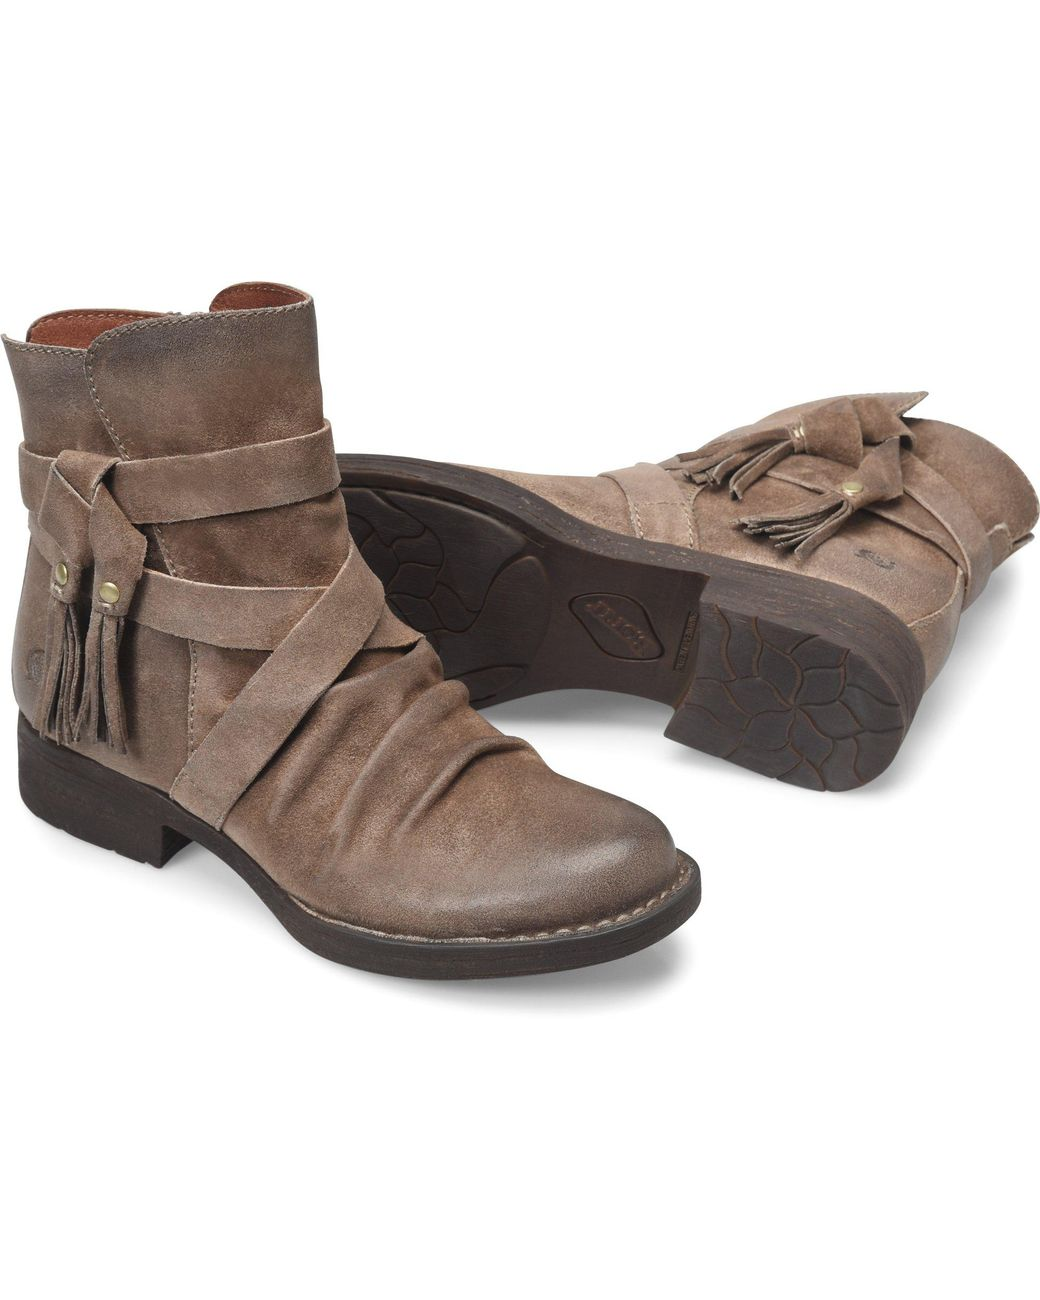 ab59751d5ae581 Børn. Women s Brown Eton.  150  99 From Born Shoes